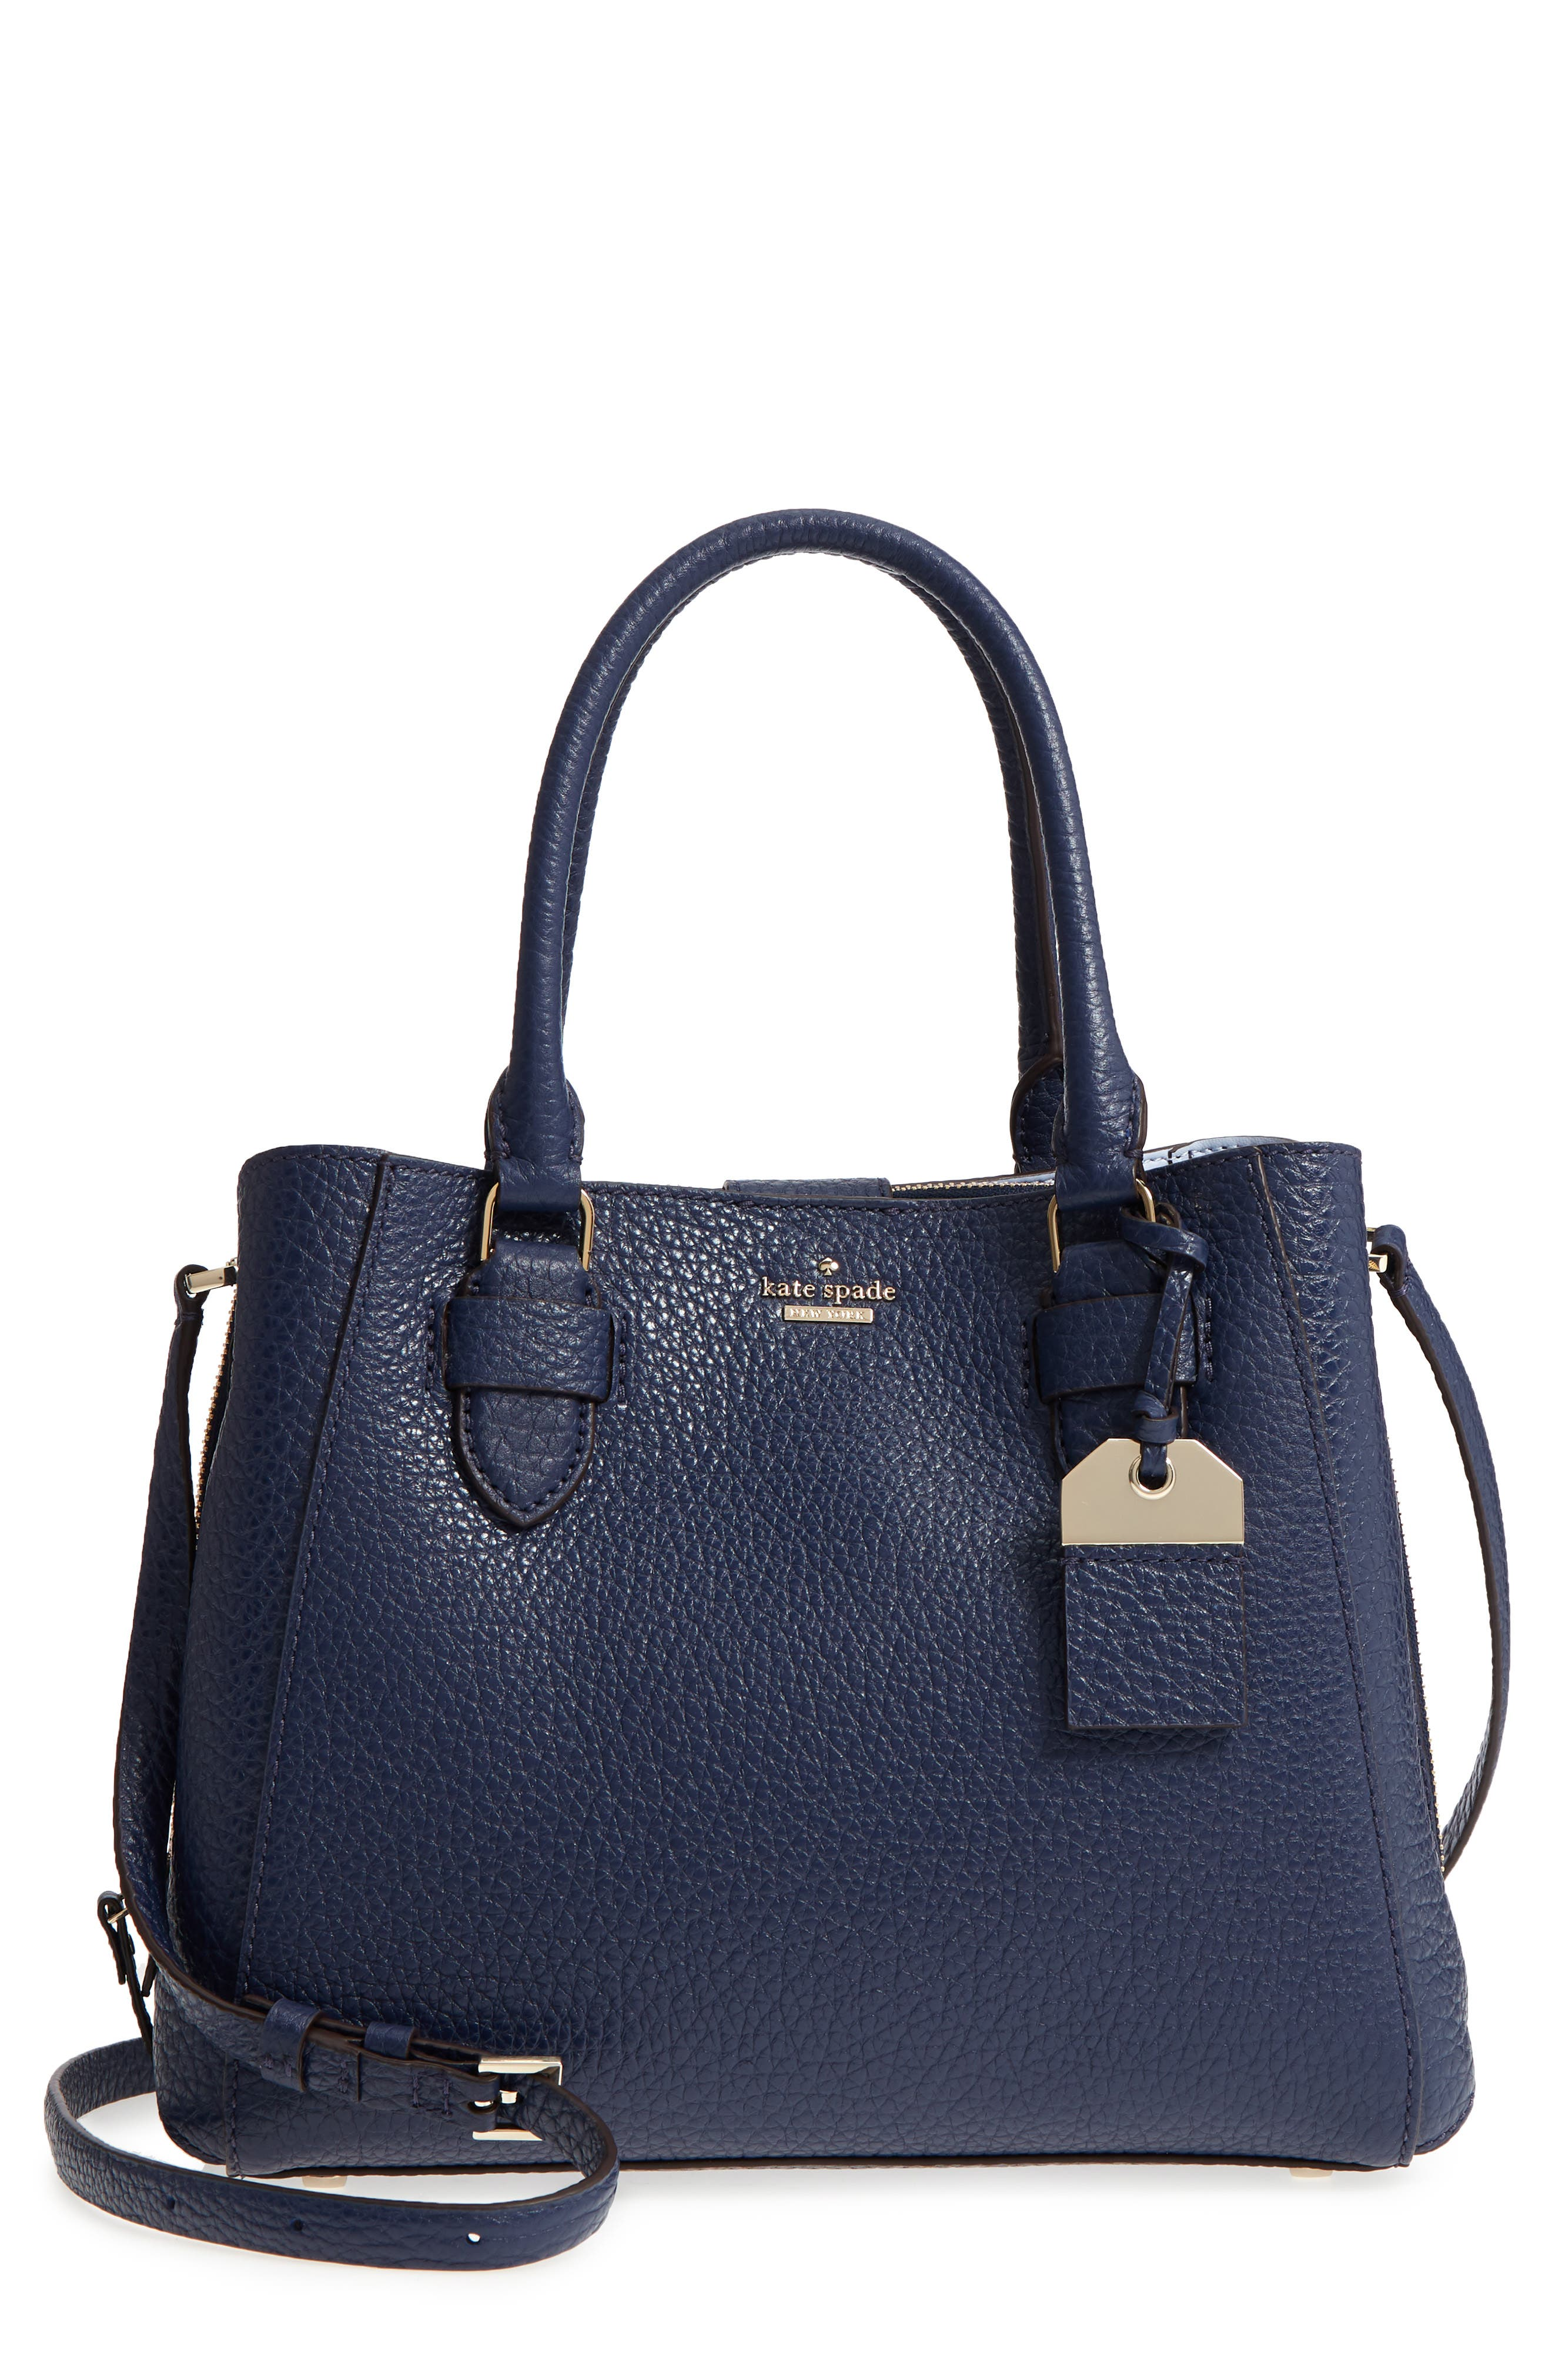 Alternate Image 1 Selected - kate spade new york carter street - aliana leather satchel